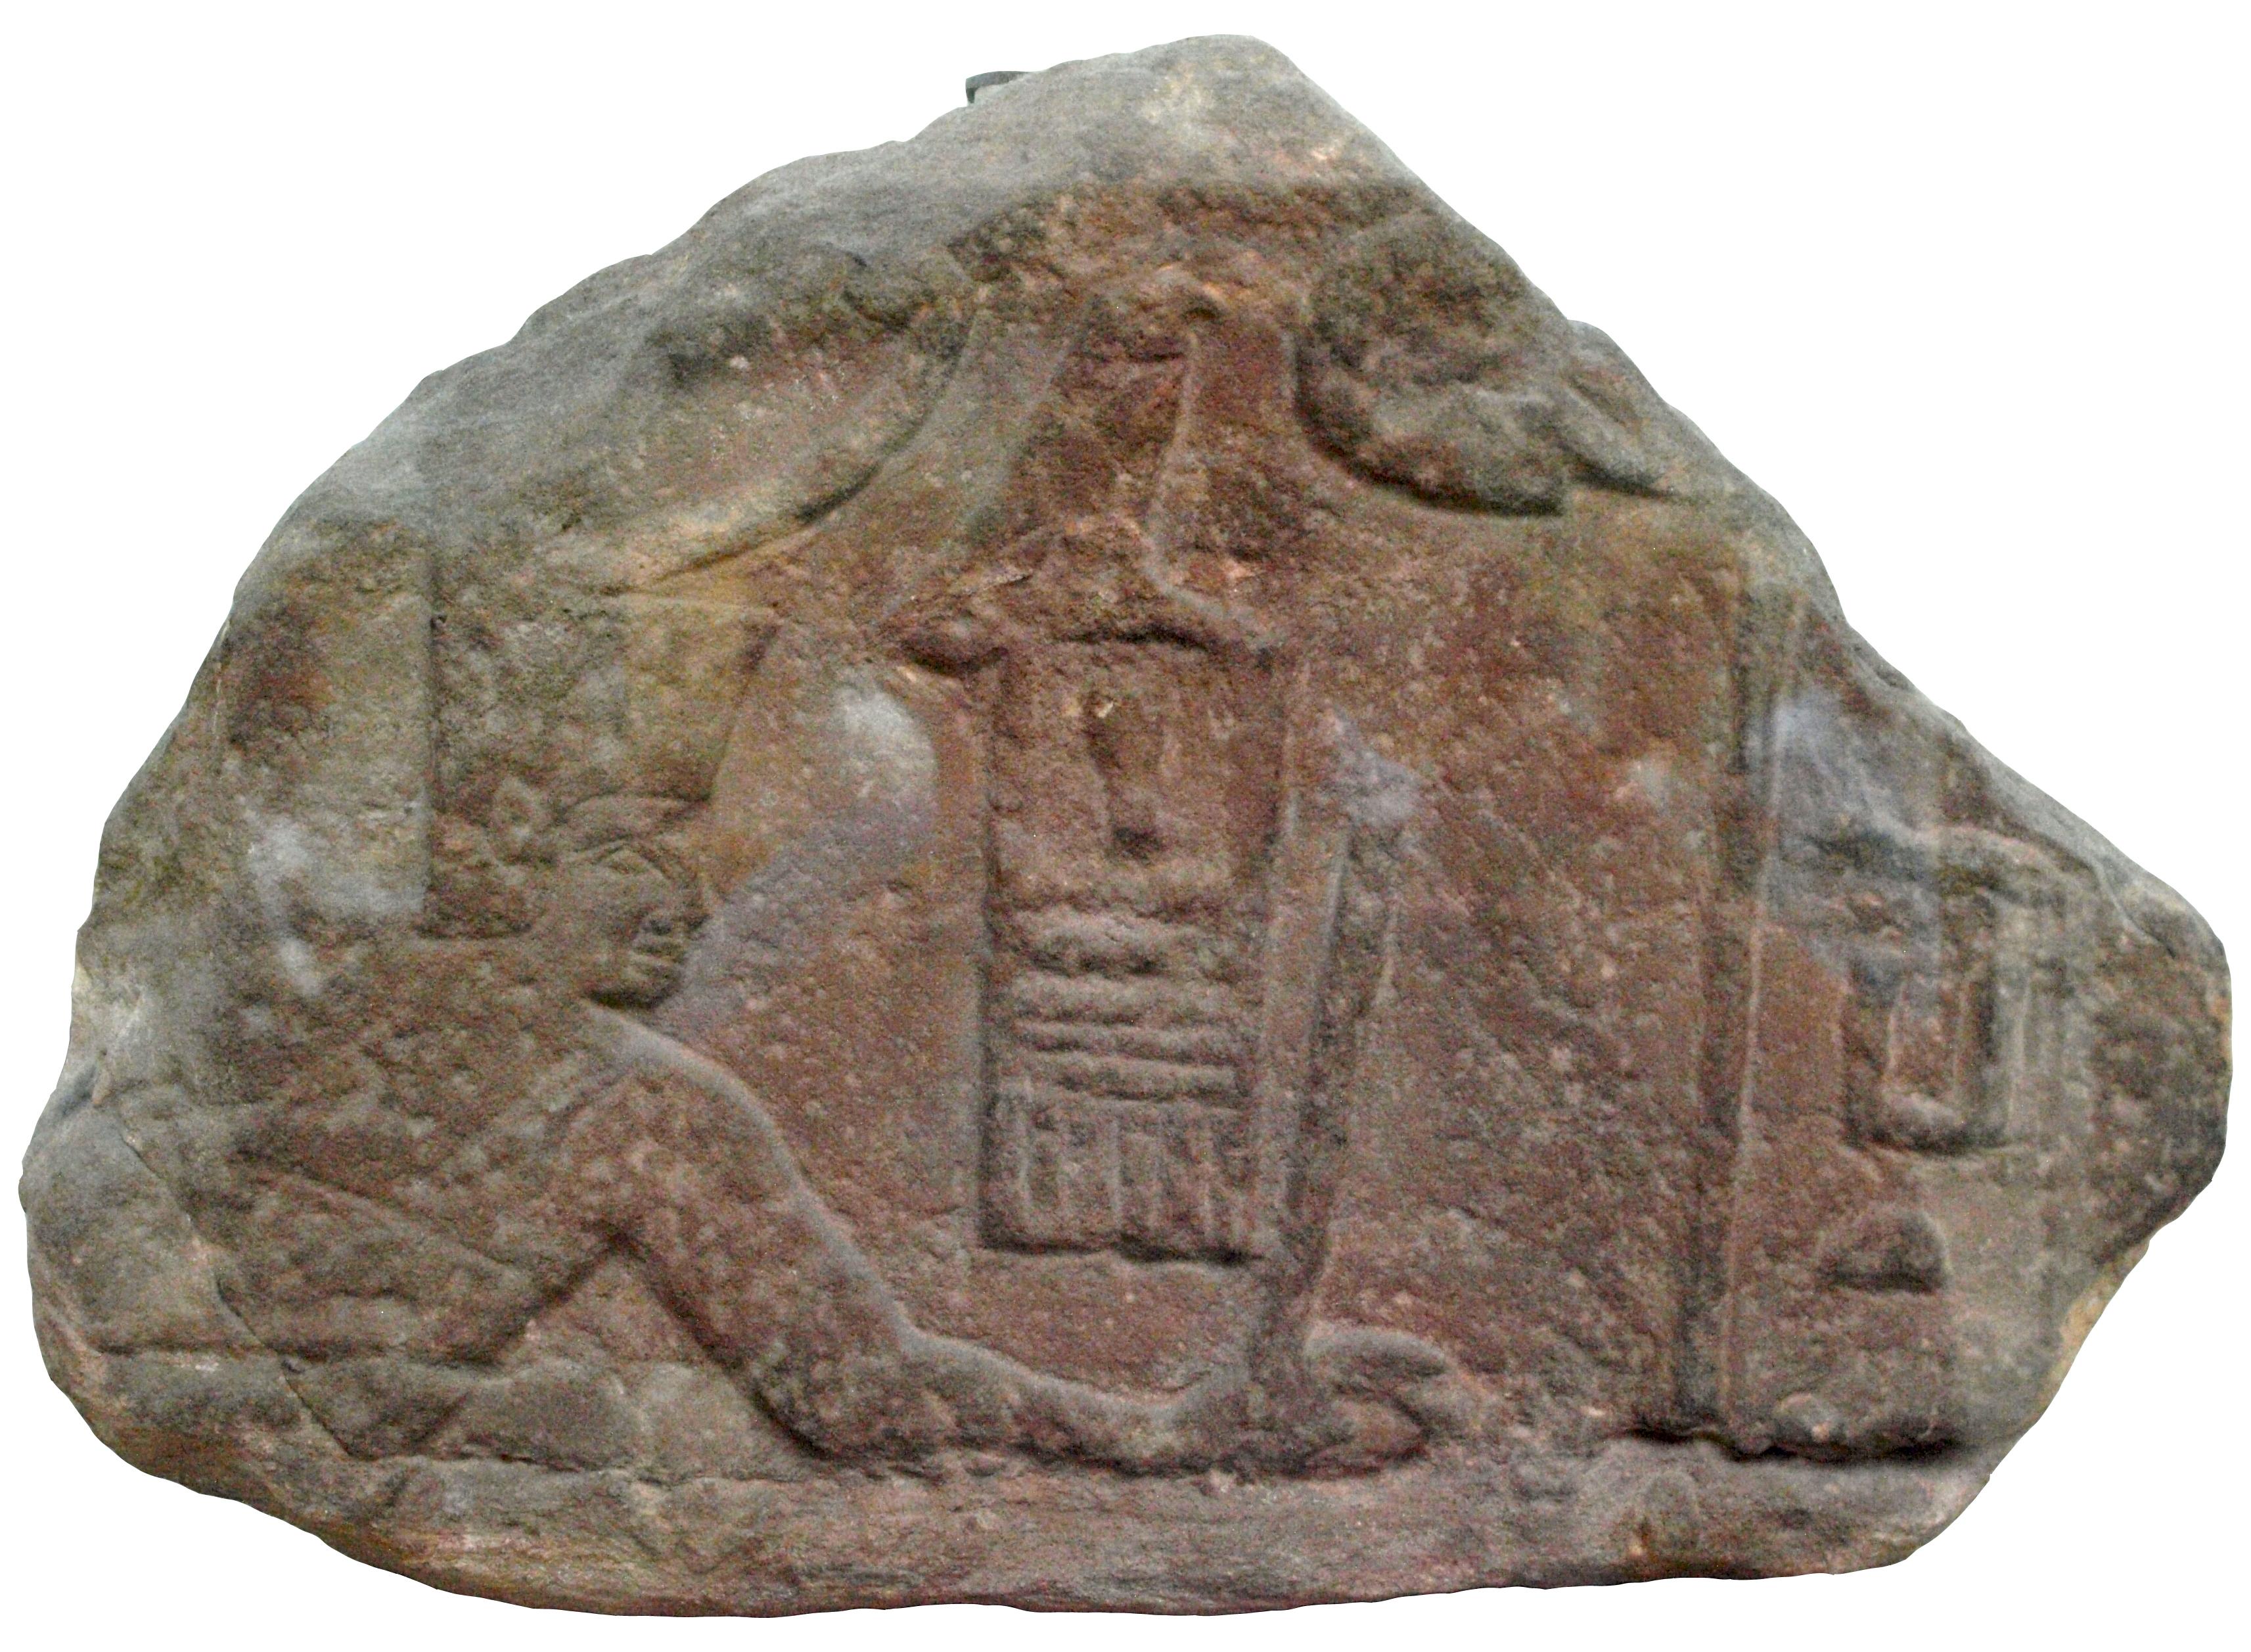 relieffragmentofpharaohsanakht-britishmuseum-august21-08.jpg